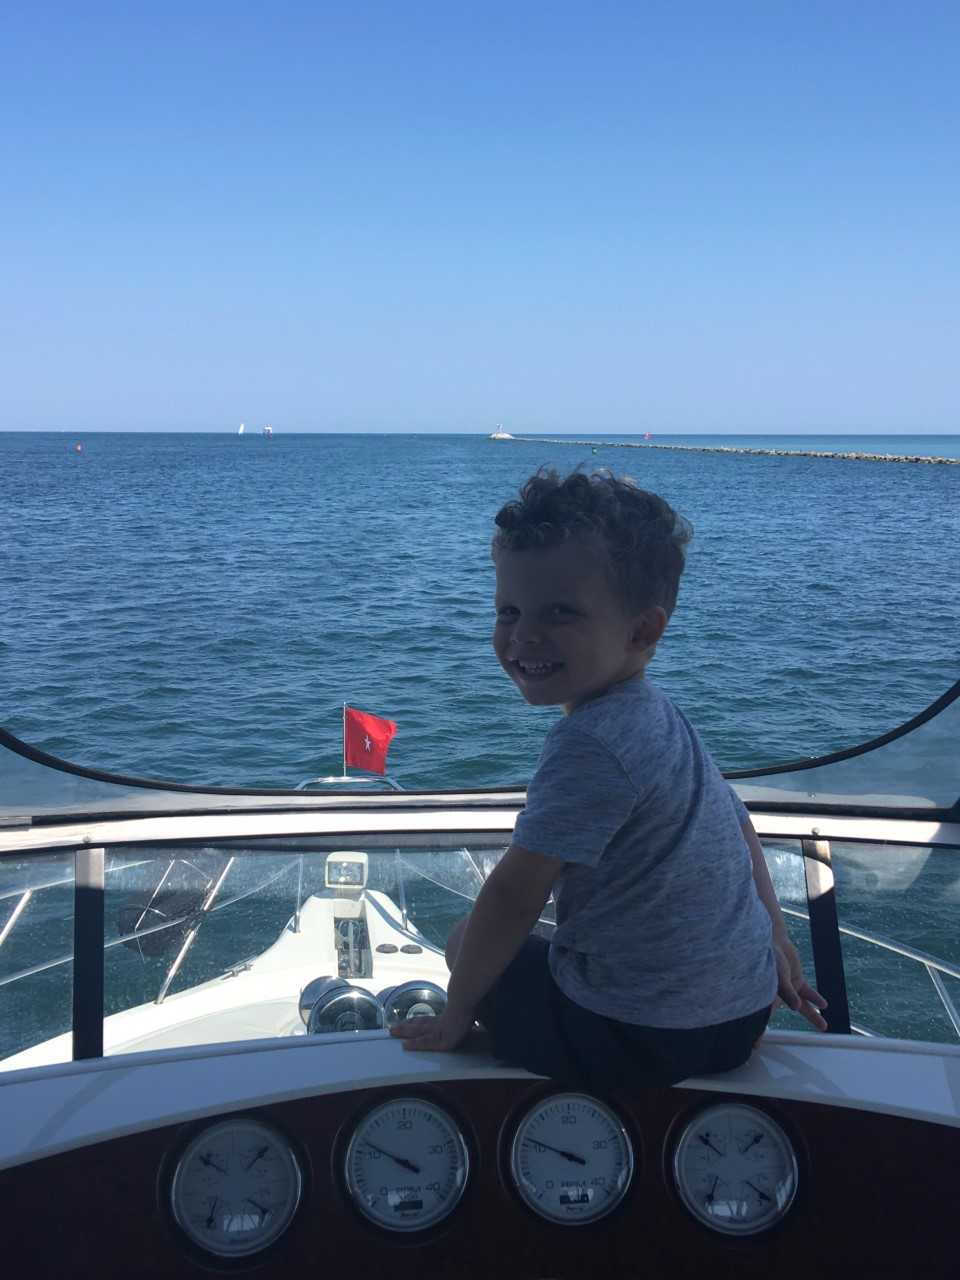 Think this kid likes boats?